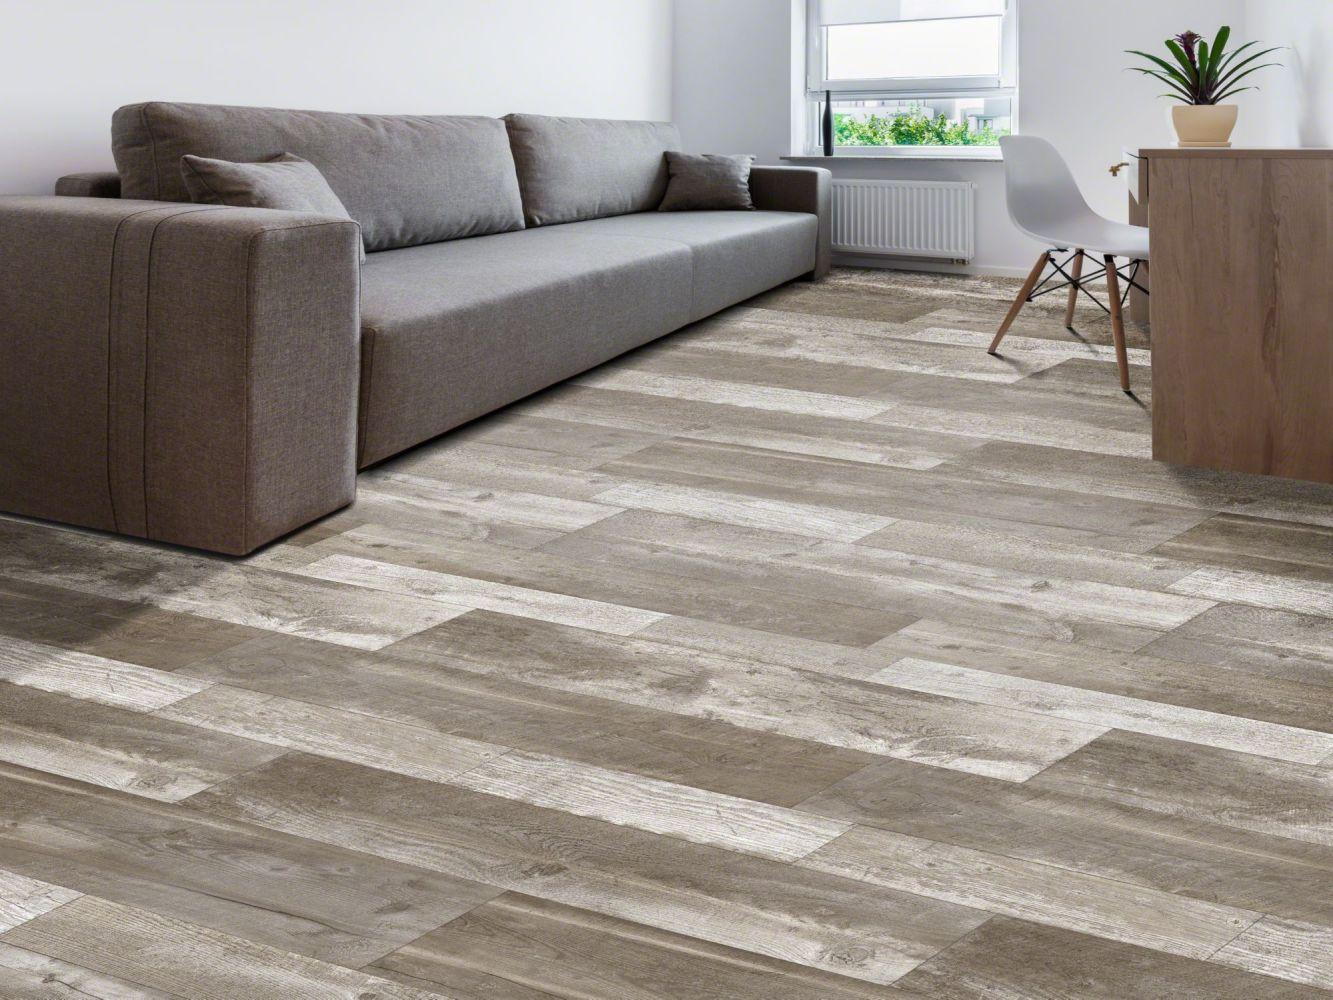 Shaw Floors Resilient Residential Coastal Plainii Nature Trail 00752_0463V